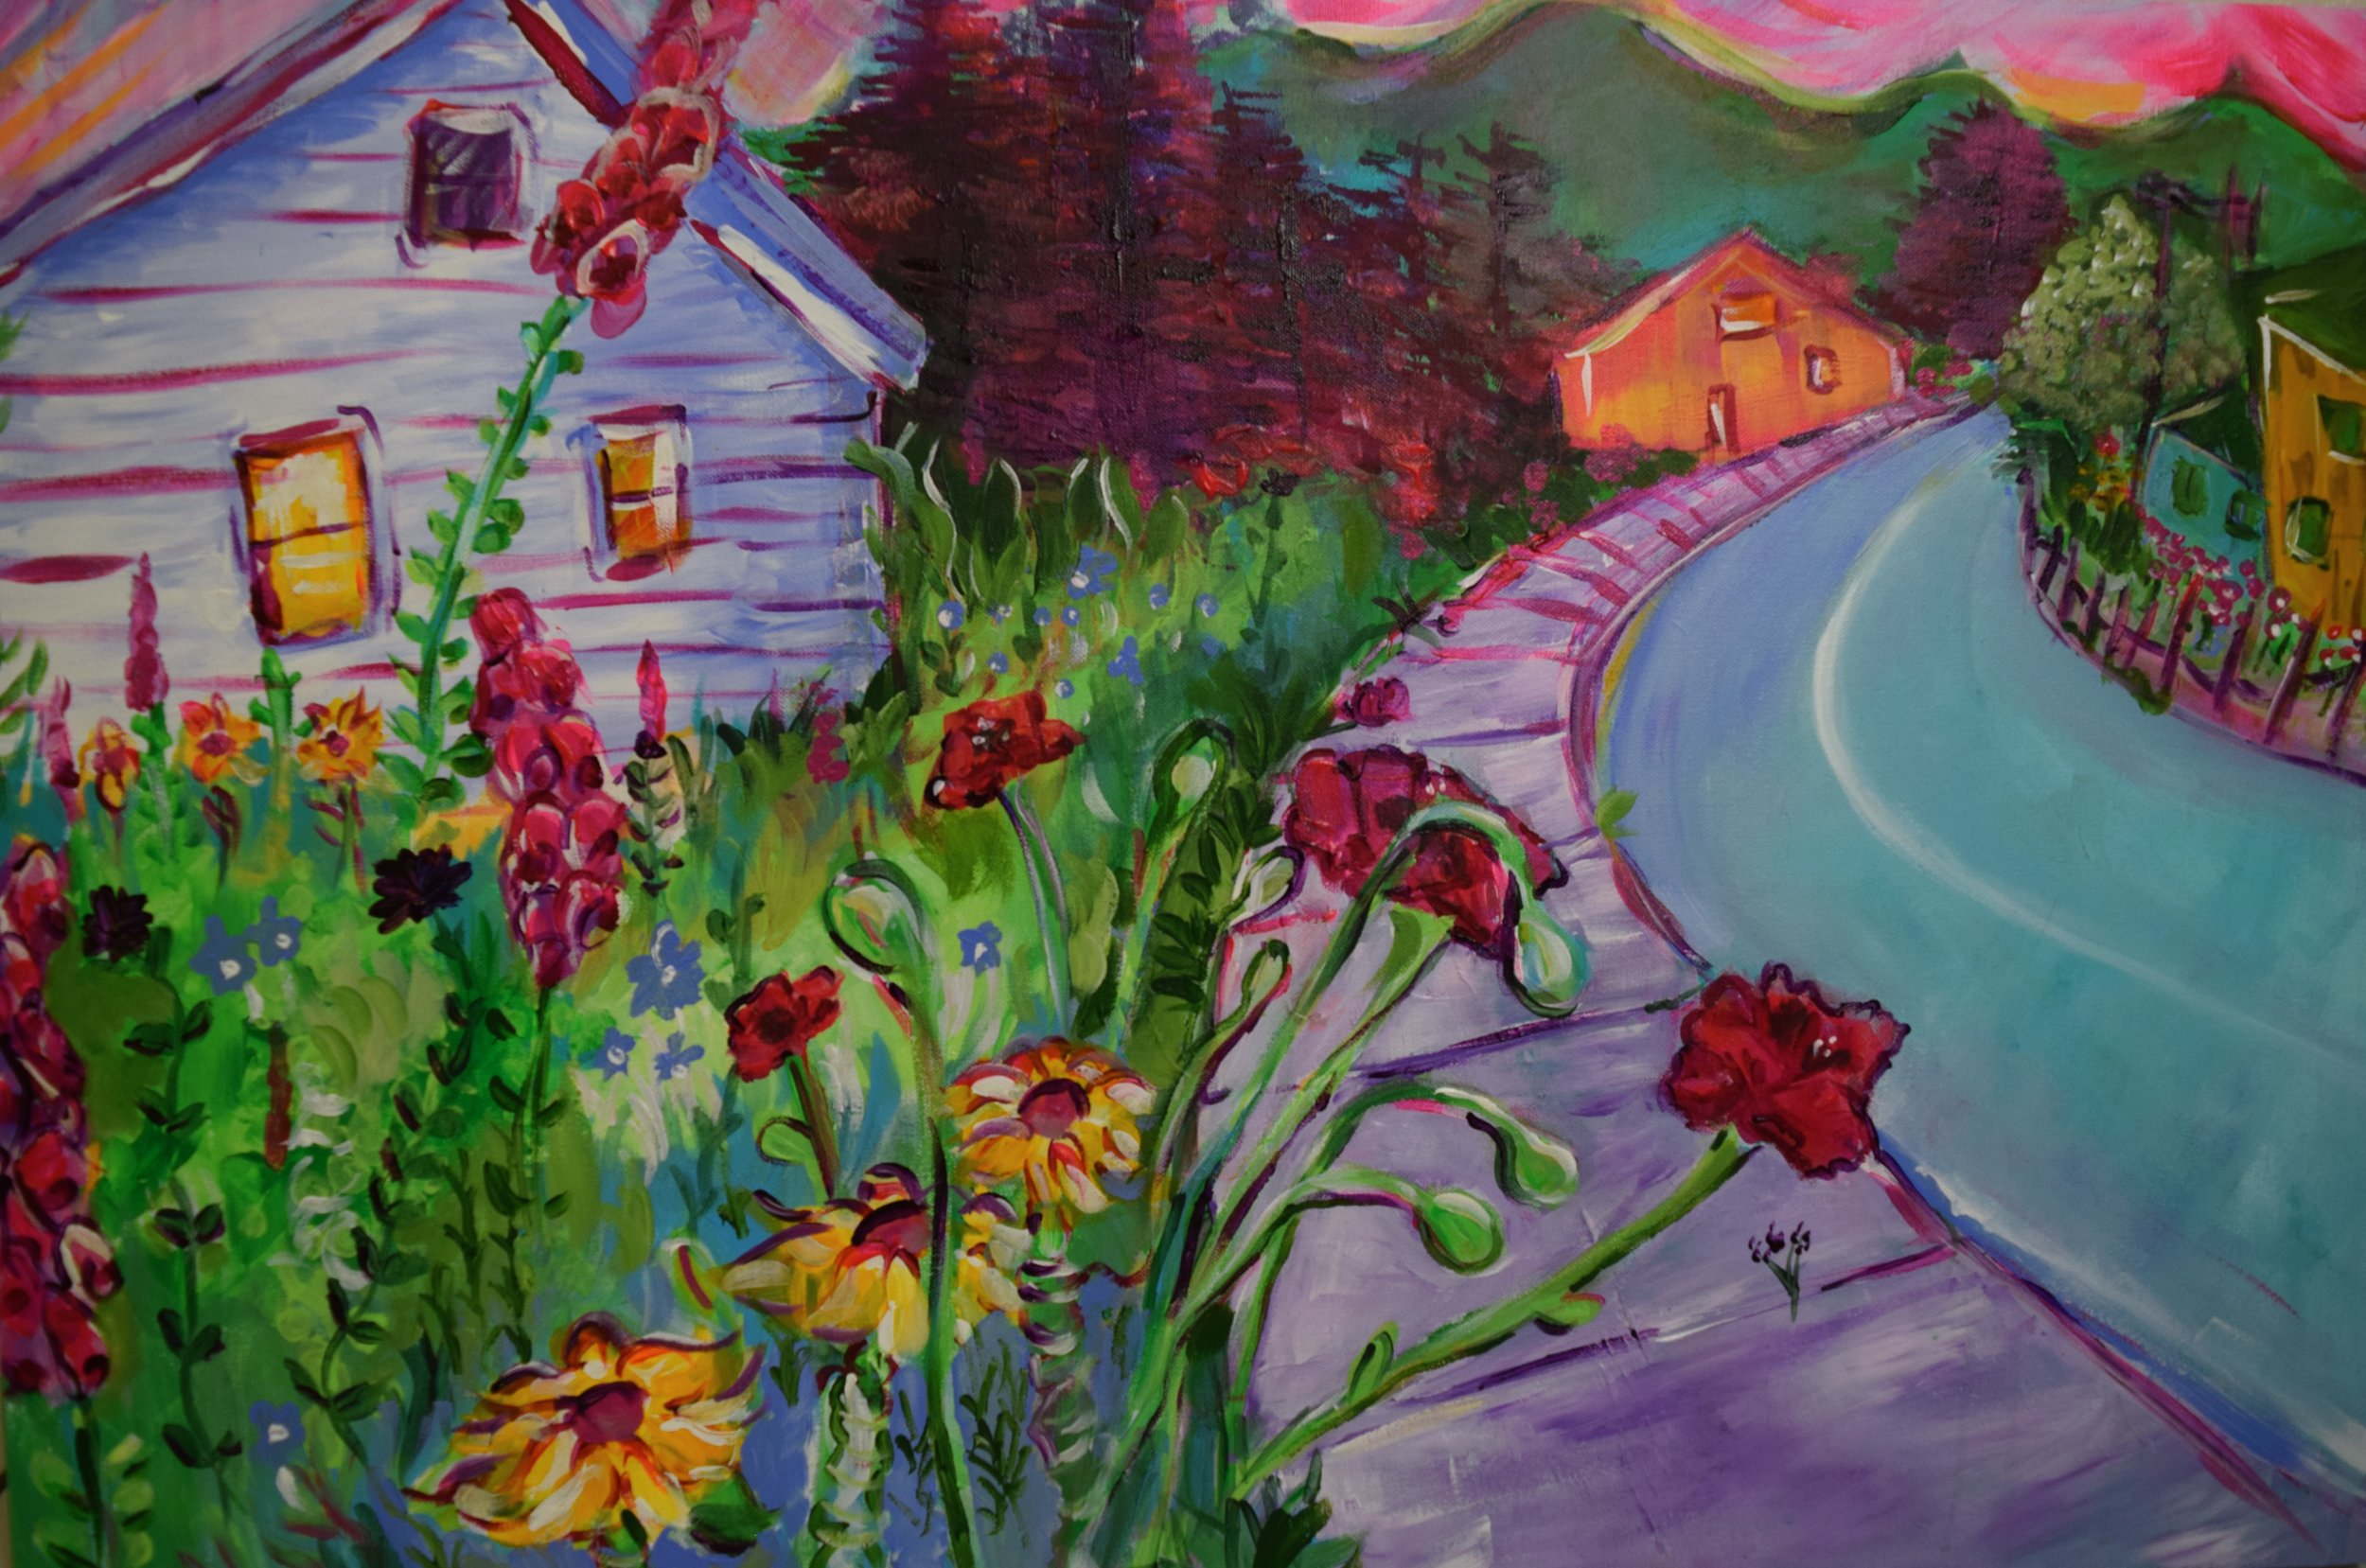 Dream Garden House Landscape, Acrylic on Canvas, 24 x 36, April 2017